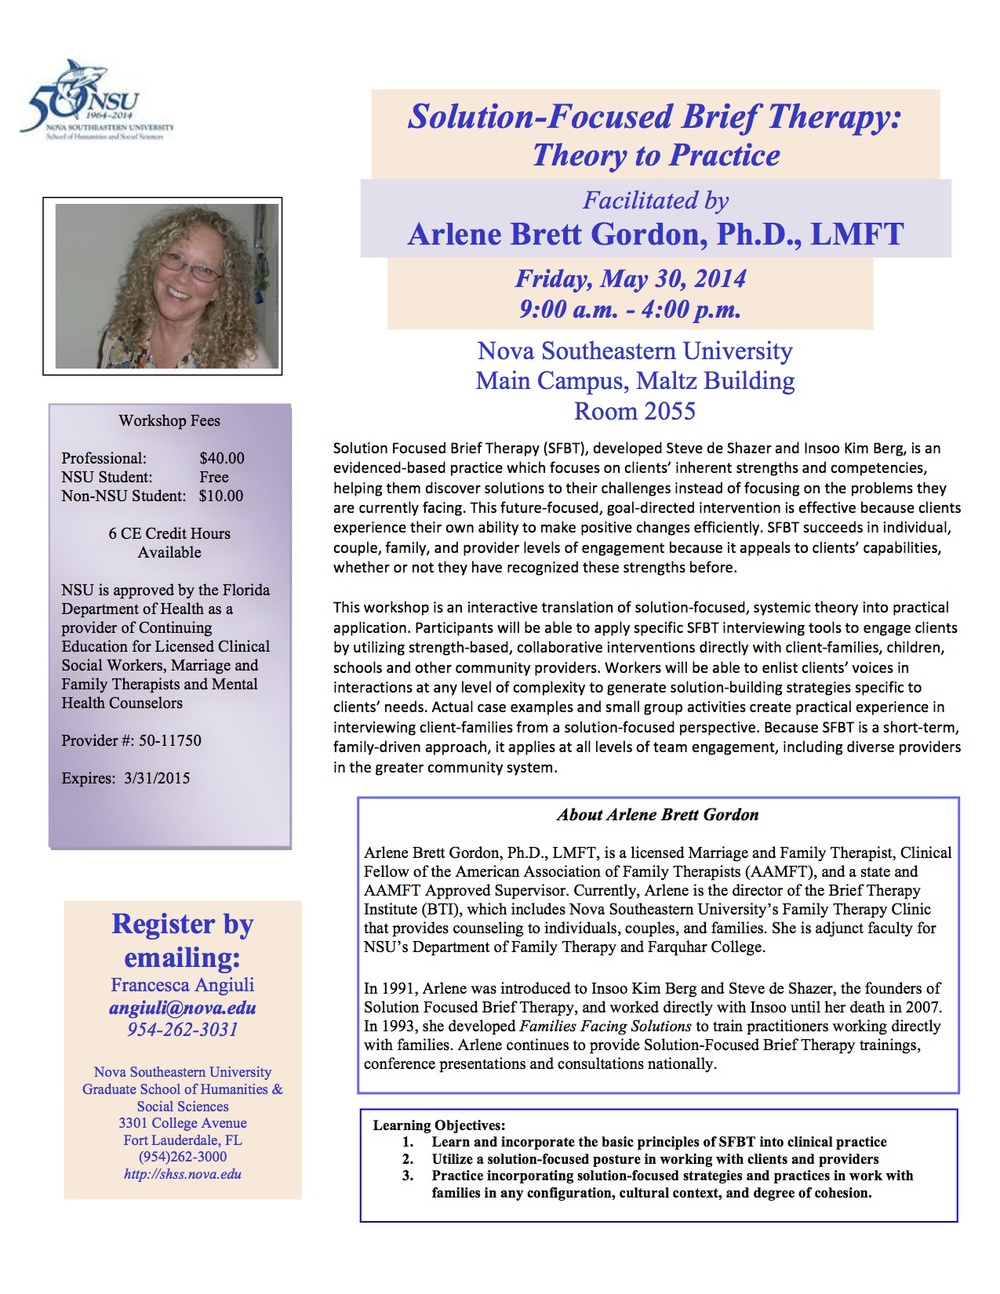 Personal Space Worksheets | Free Printable Math Worksheets - Mibb ...